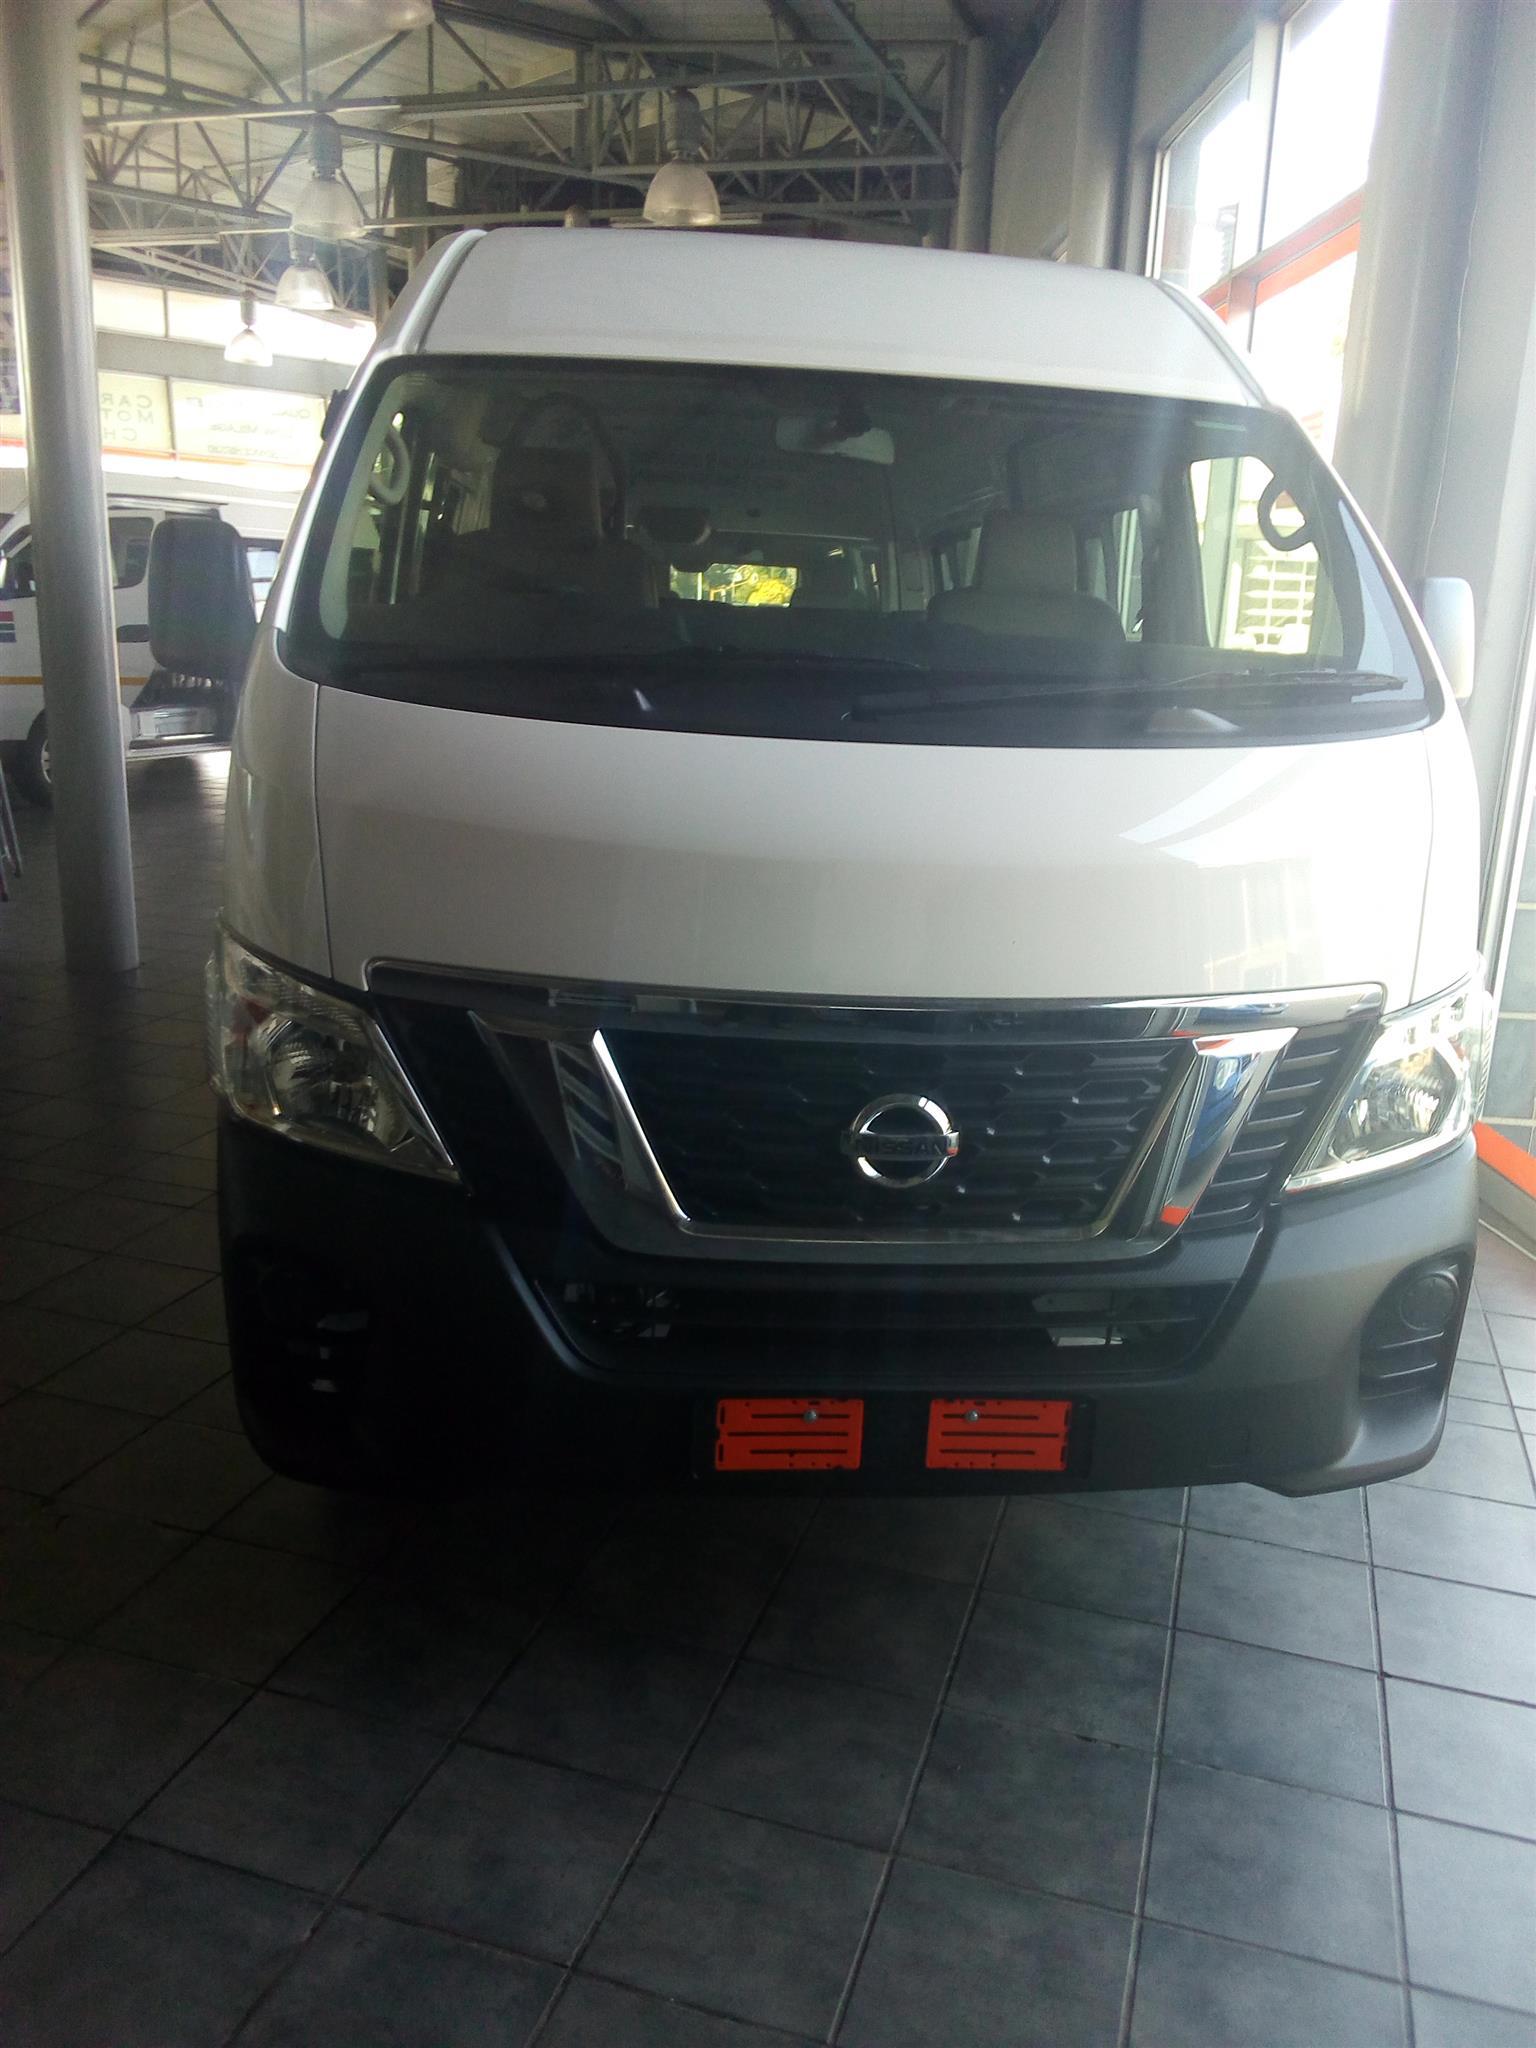 2019 Nissan NV350 panel van wide body 2.5i